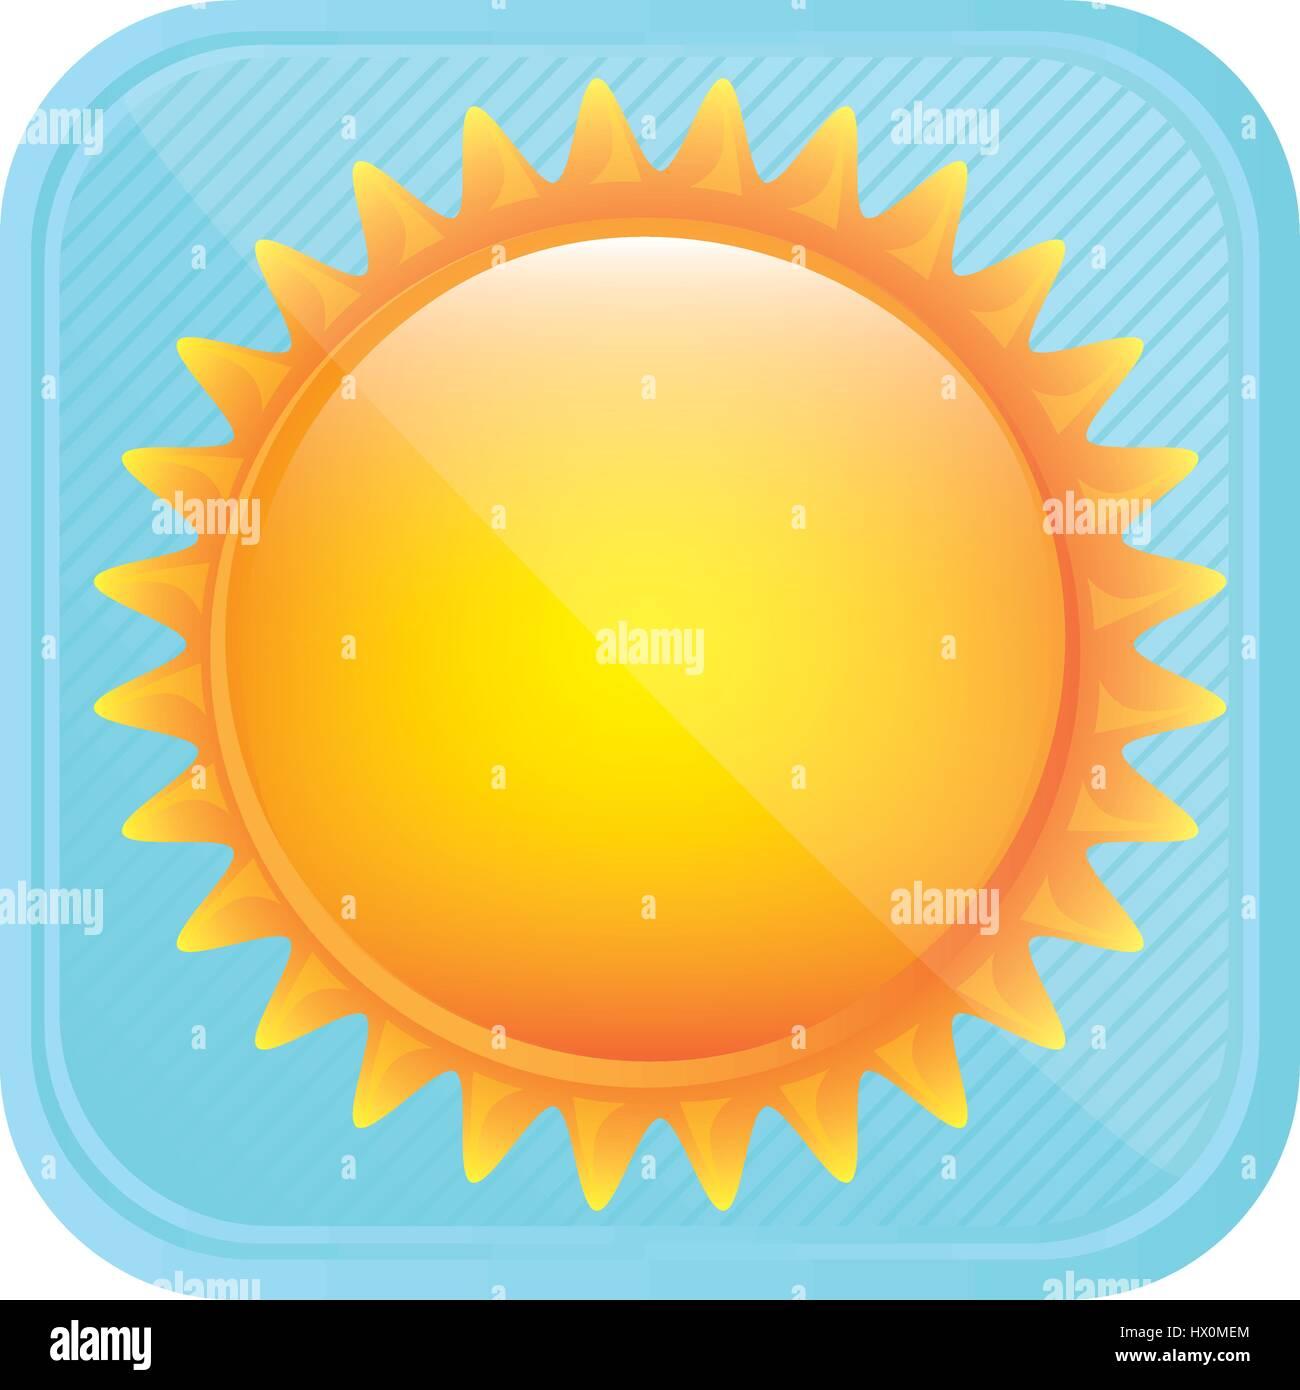 yellow light sun icon - Stock Image